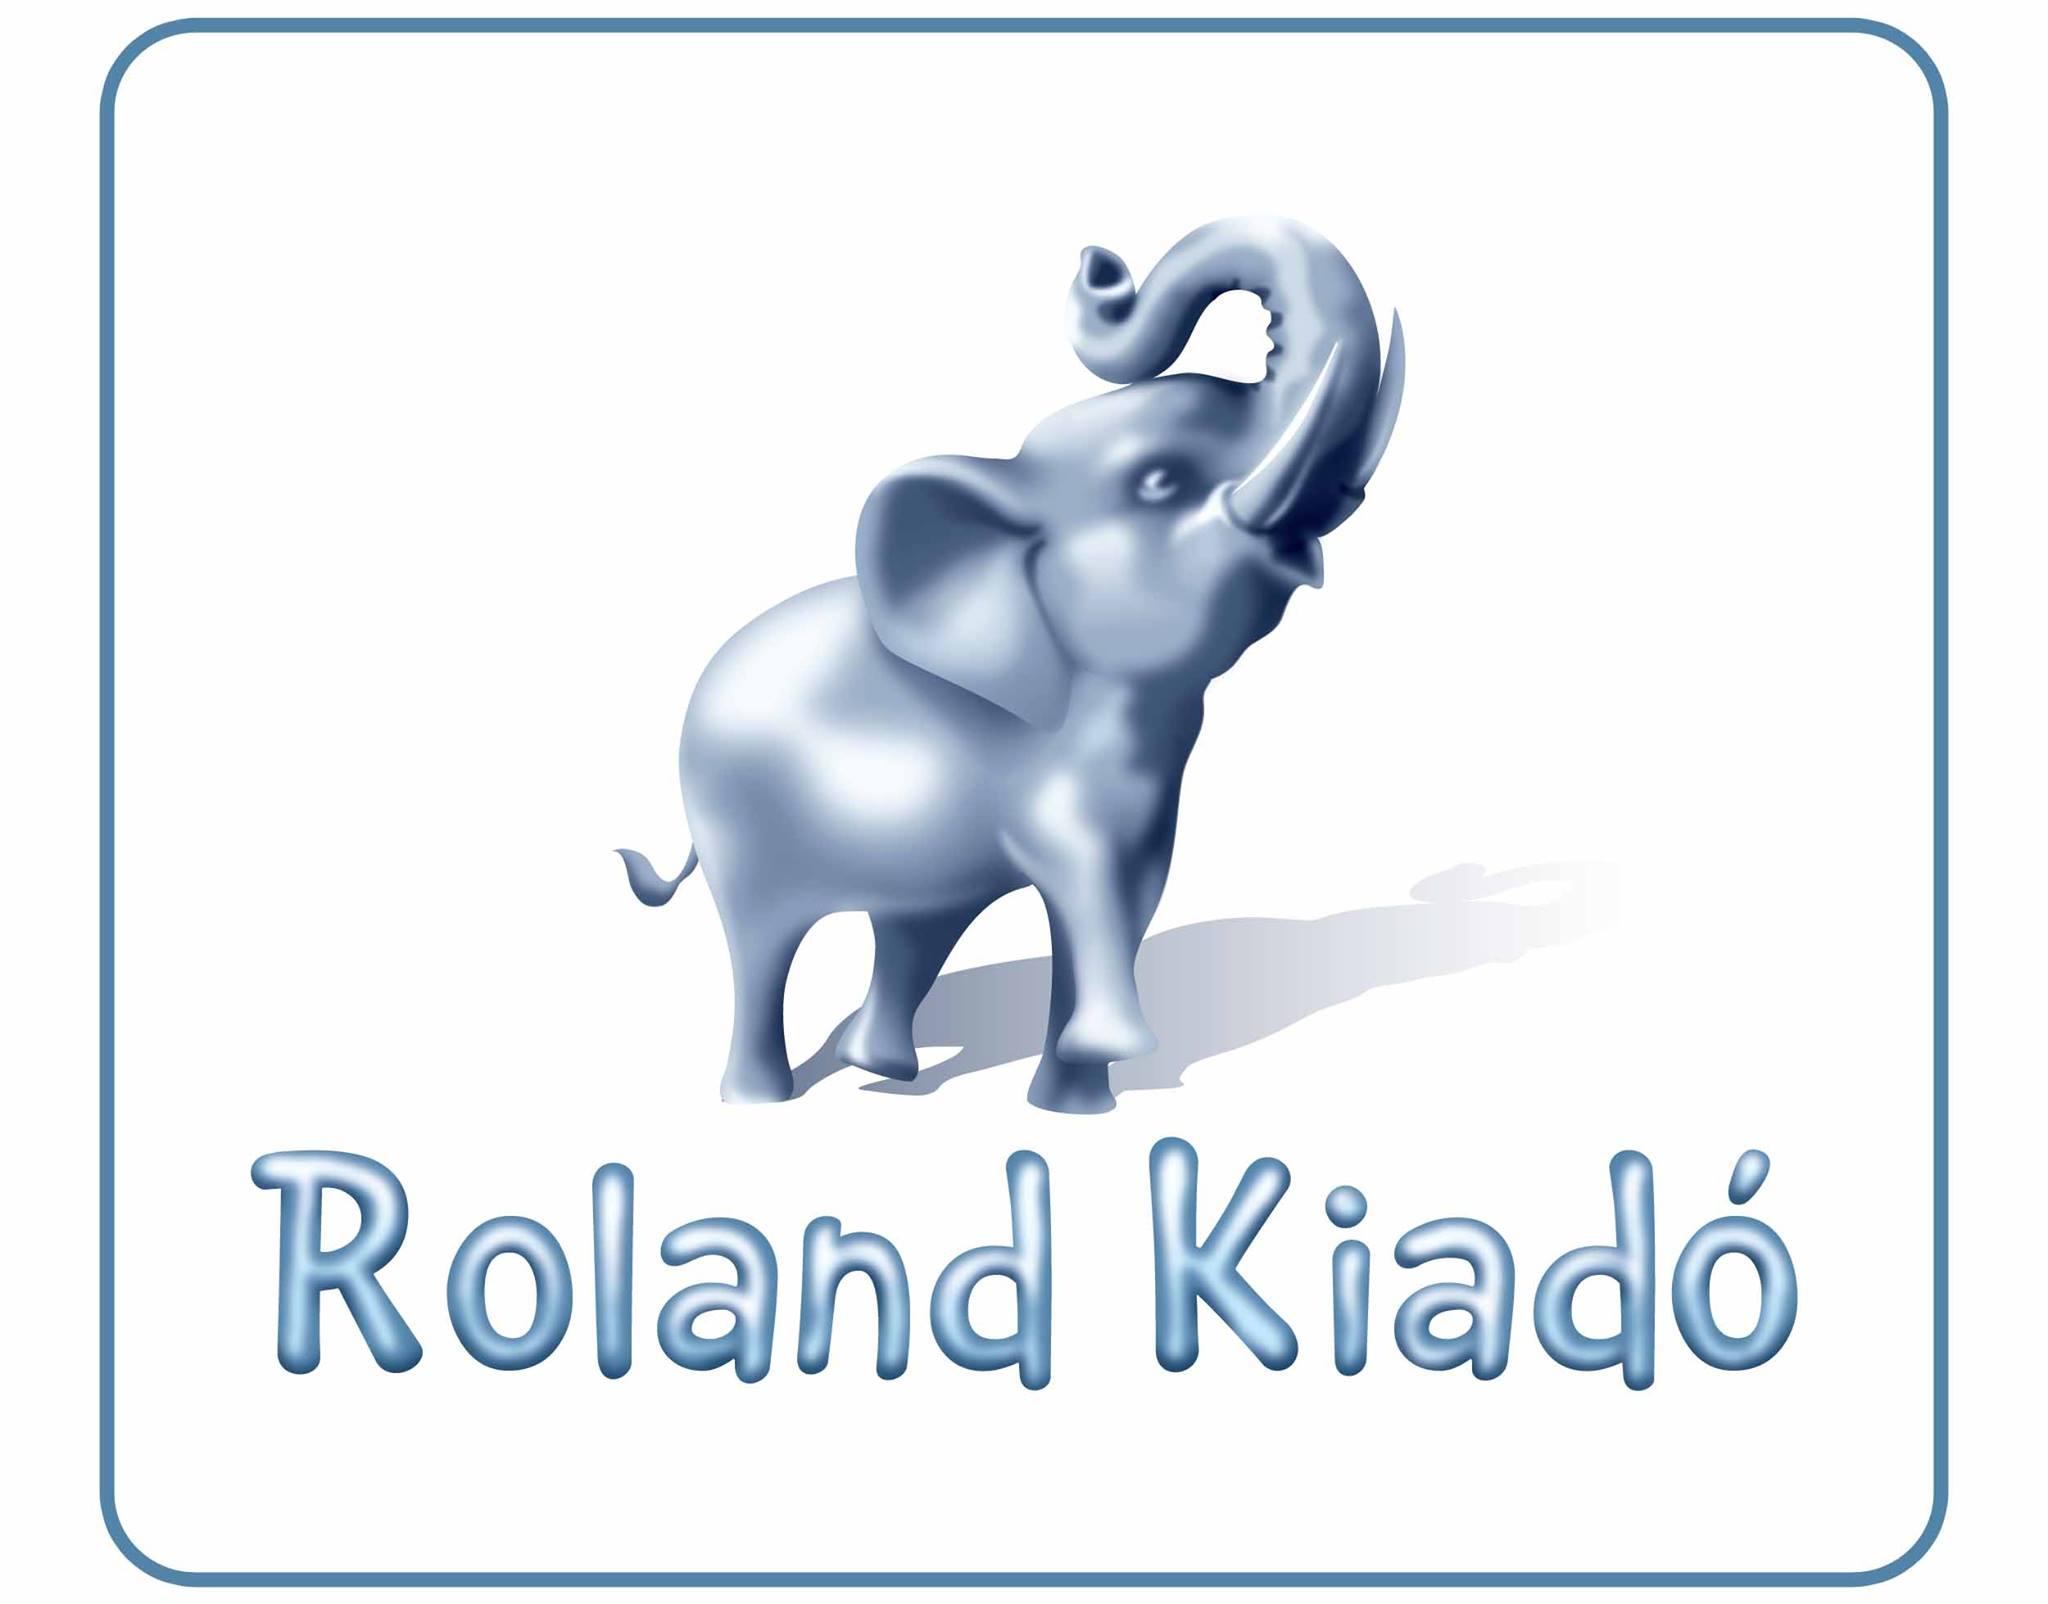 Roland Toys Kft.